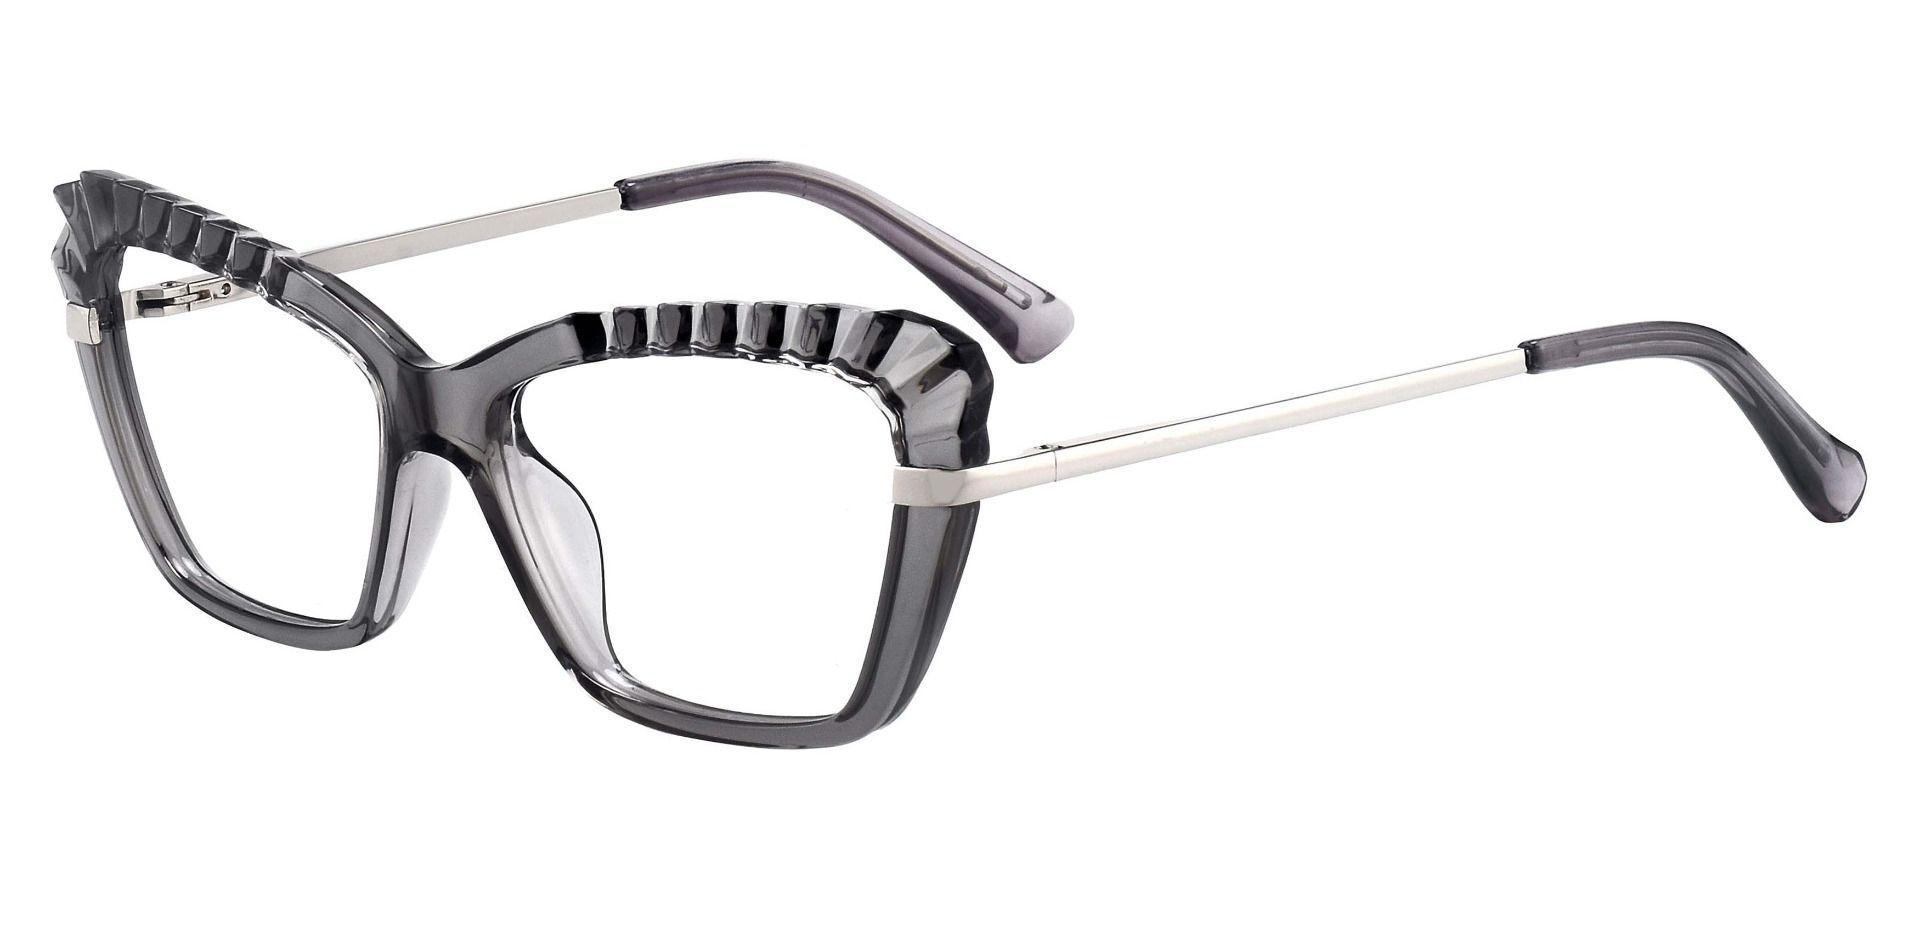 Caldwell Cat Eye Prescription Glasses - Gray